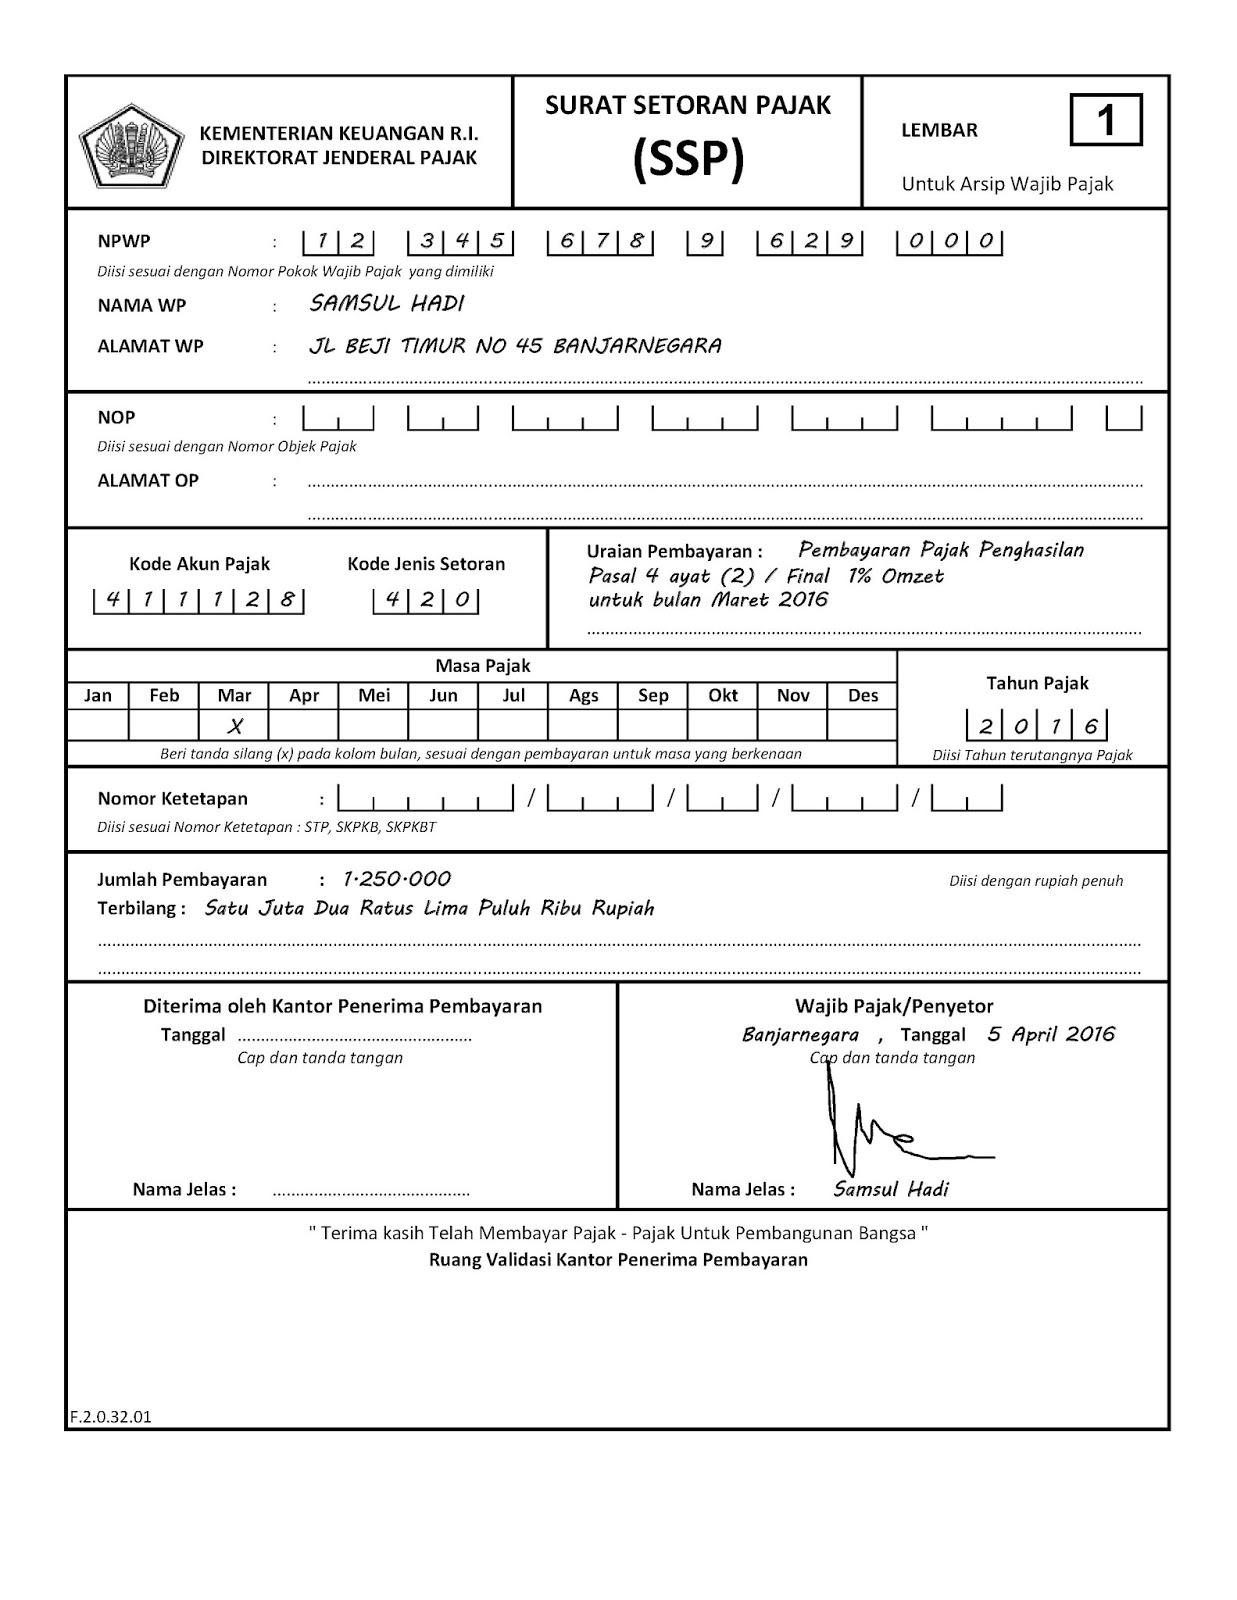 contoh surat setoran pajak elektronik surat 6